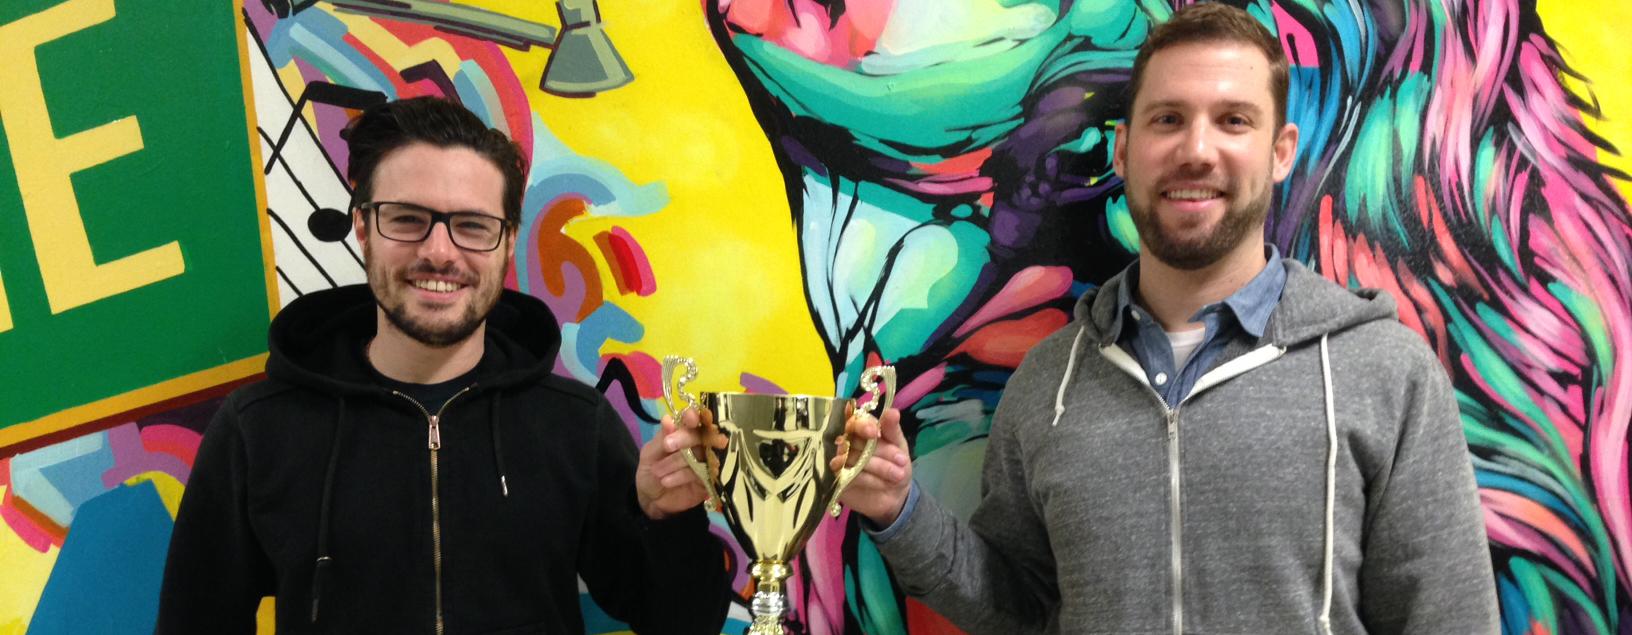 Innovation's Dynamic Digital Duo – Hackathon Winners!